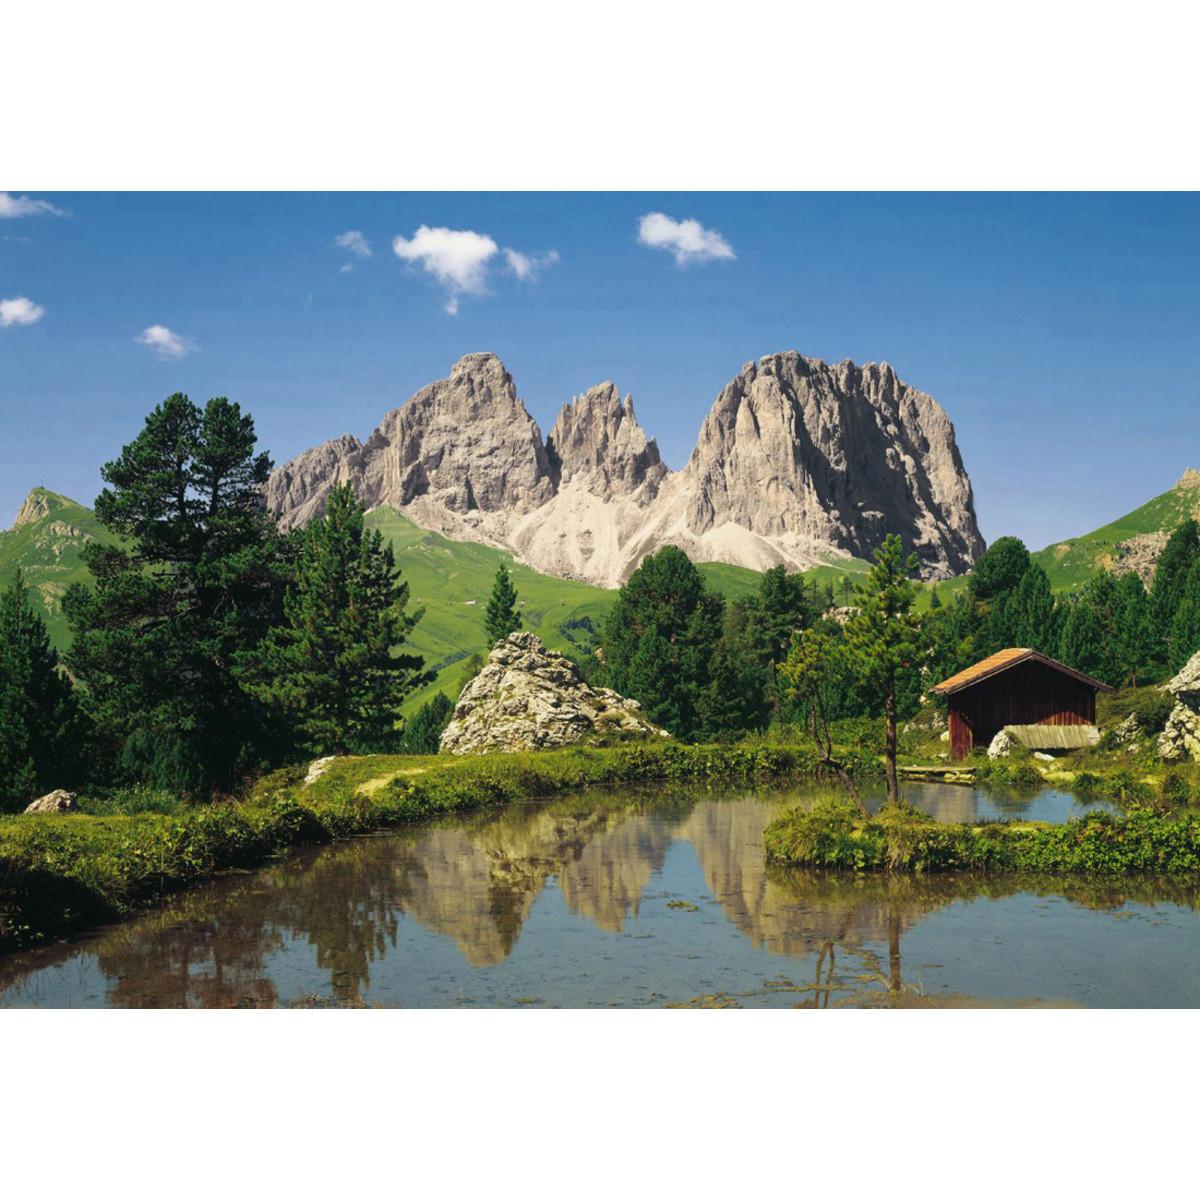 Фотообои Komar Dolomiten 8-9017 388х270 см